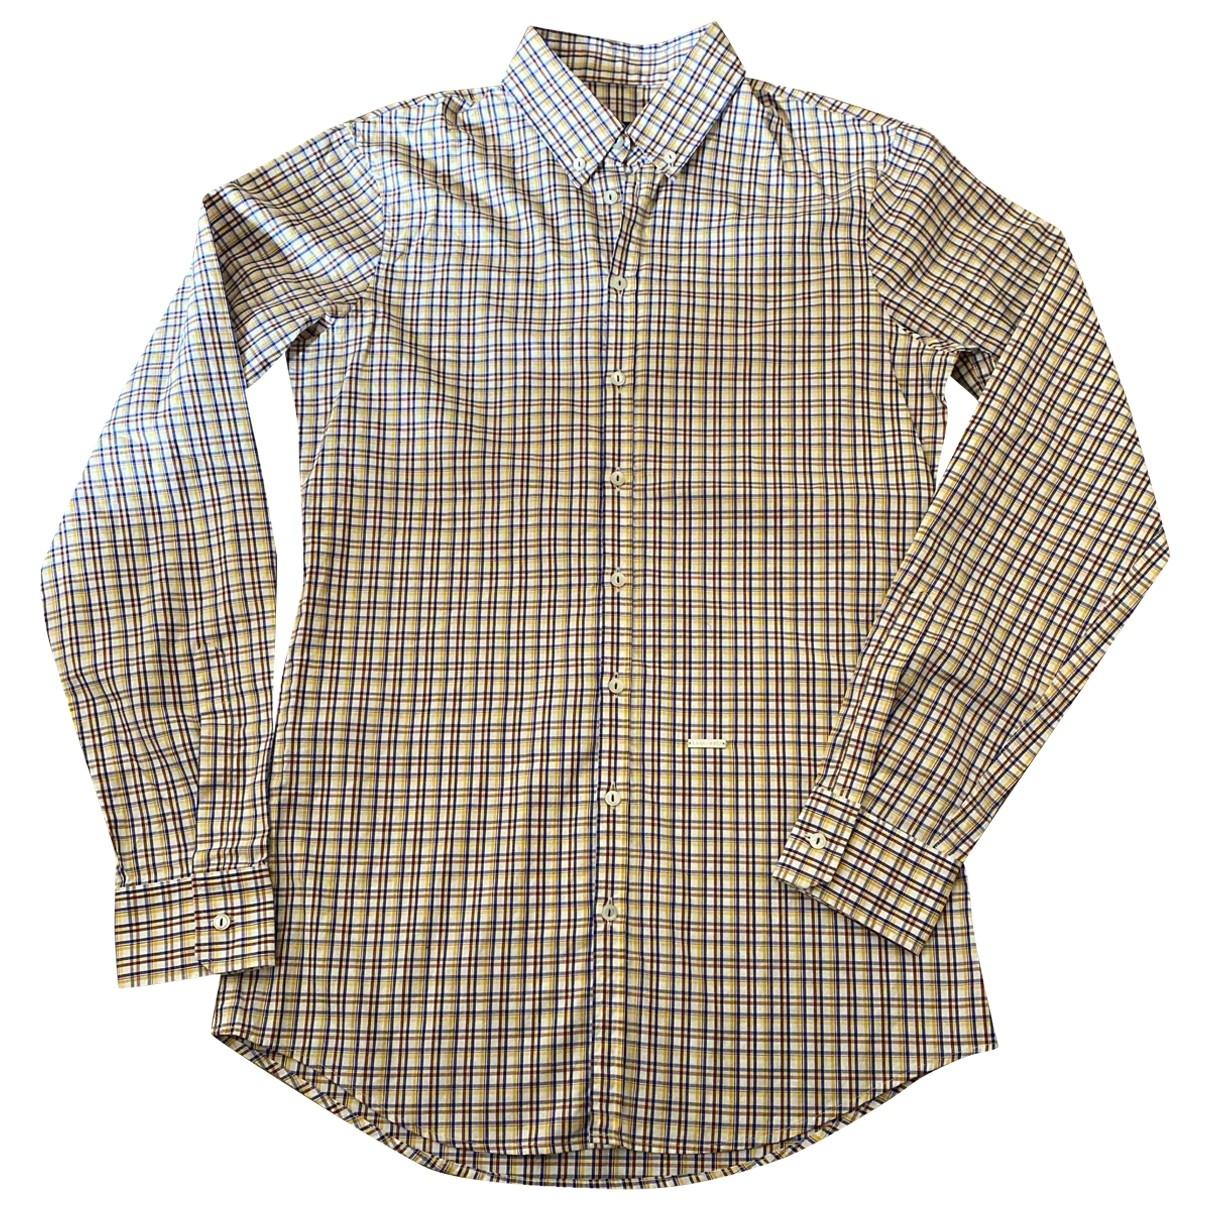 Dsquared2 \N Multicolour Cotton Shirts for Men M International